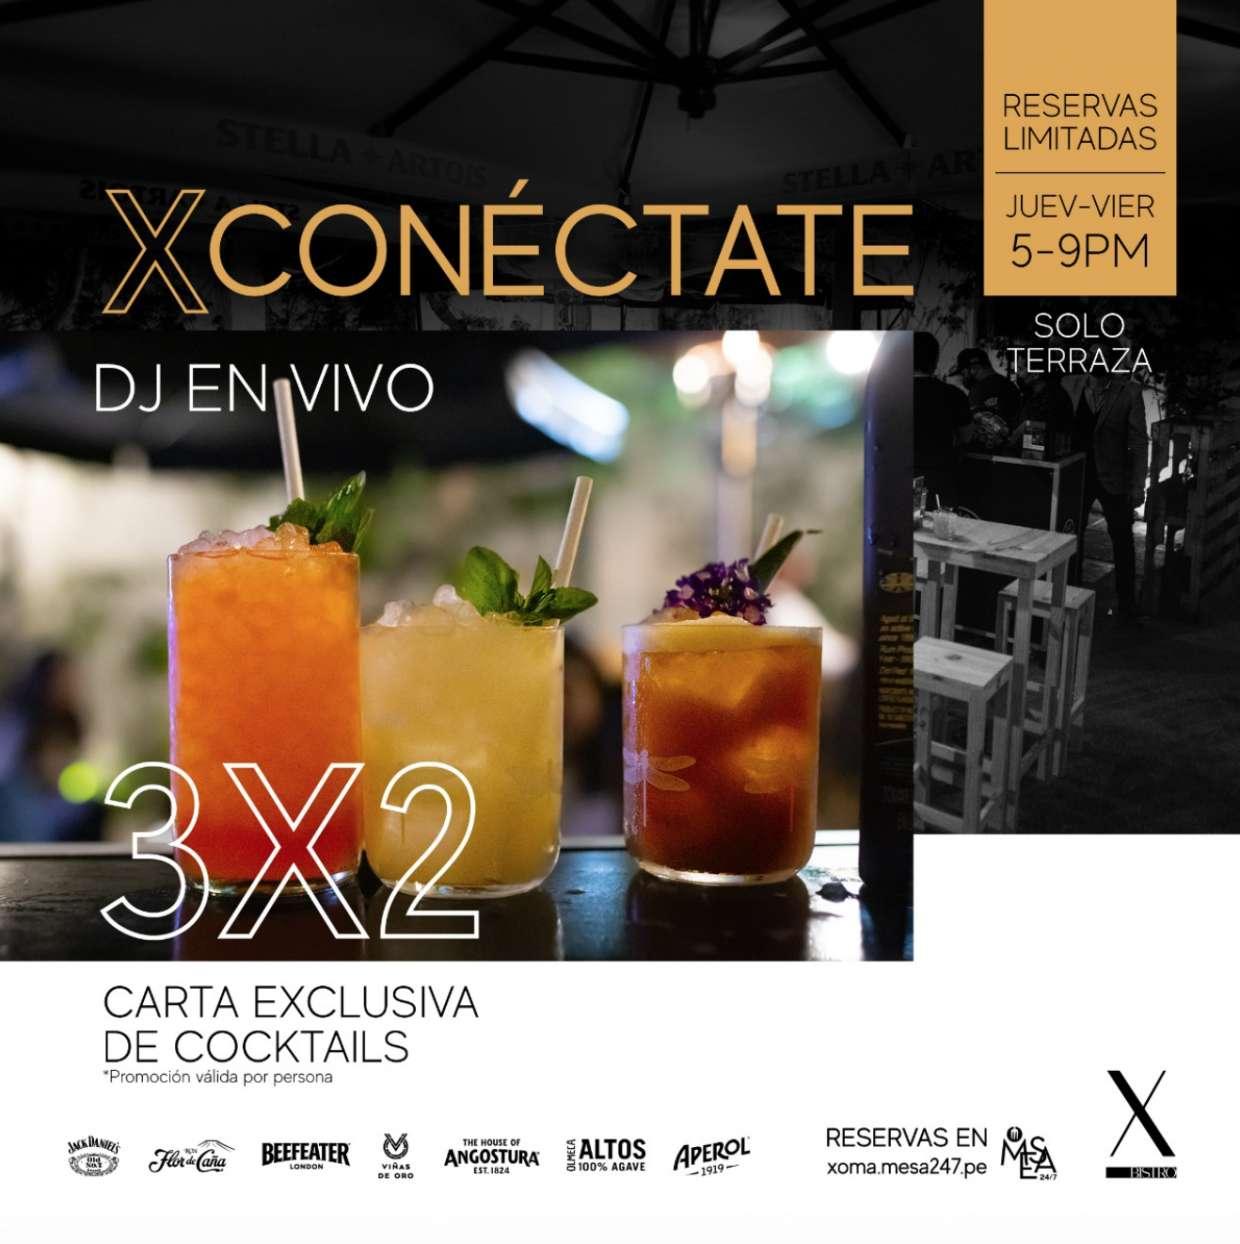 XConéctate - 3x2  carta exclusiva de cocktails